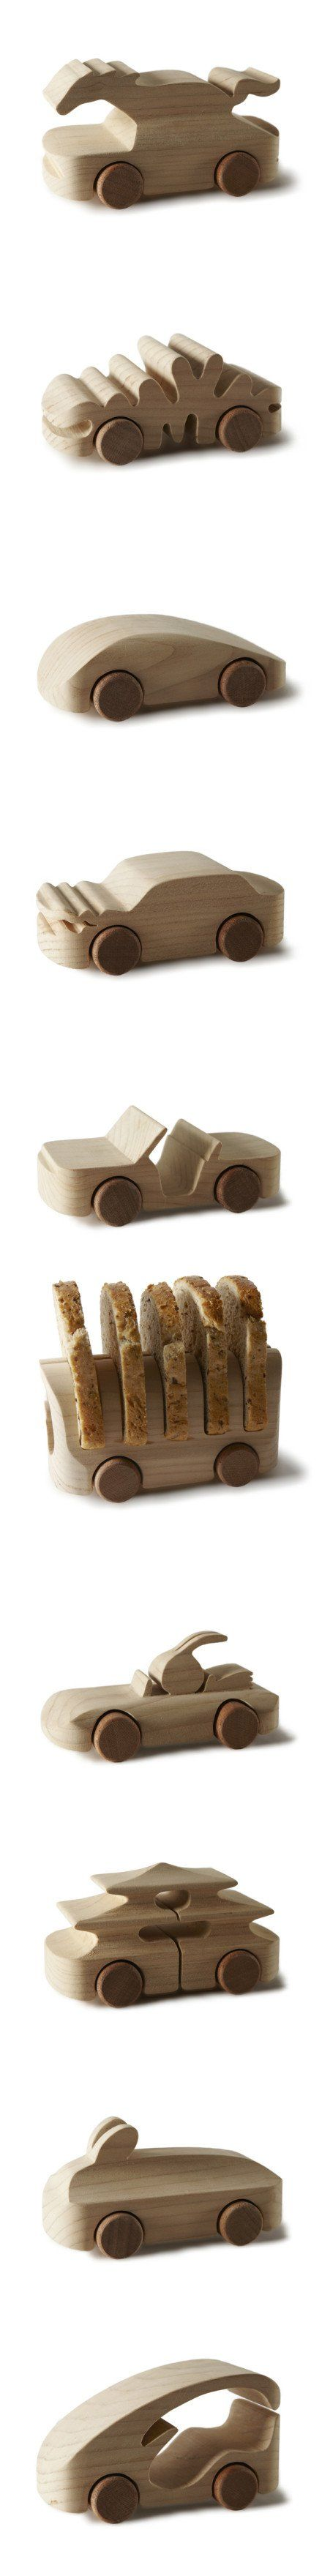 """Variety wooden cart,"" ""100% ToBeUs ..."